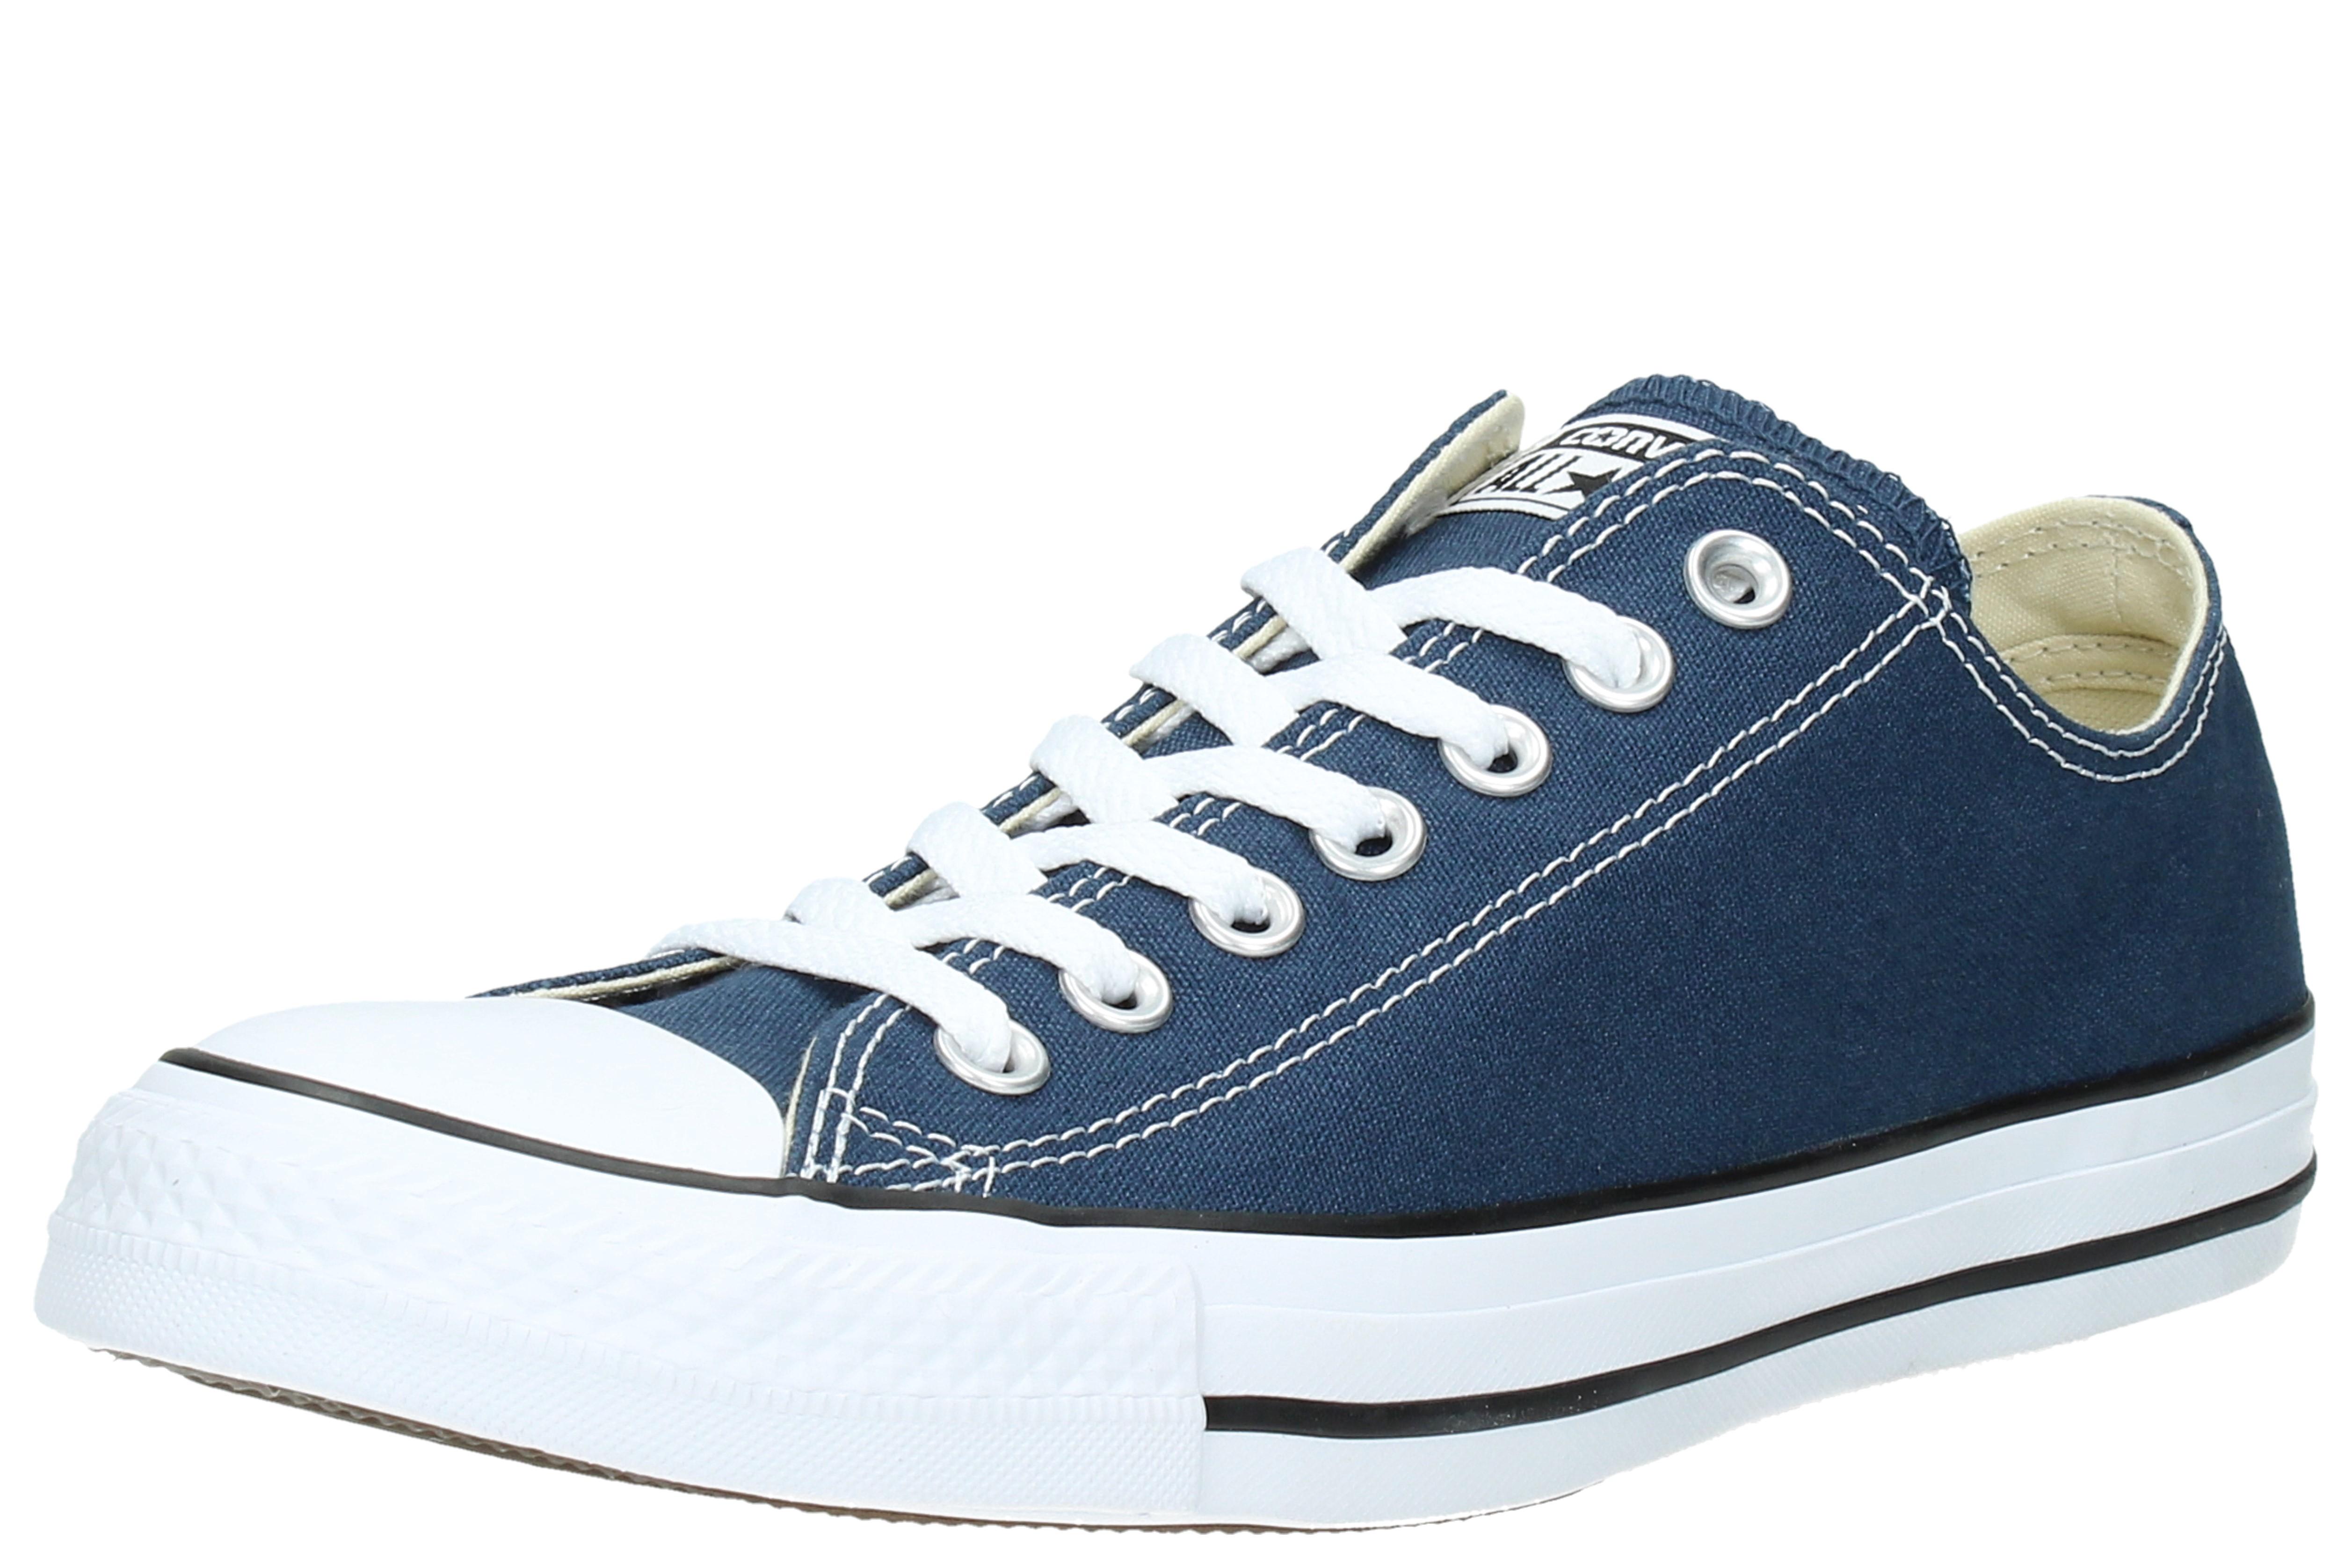 a04df3814fa Converse All Star OX - Blauw | M9697C-MEN | Converse